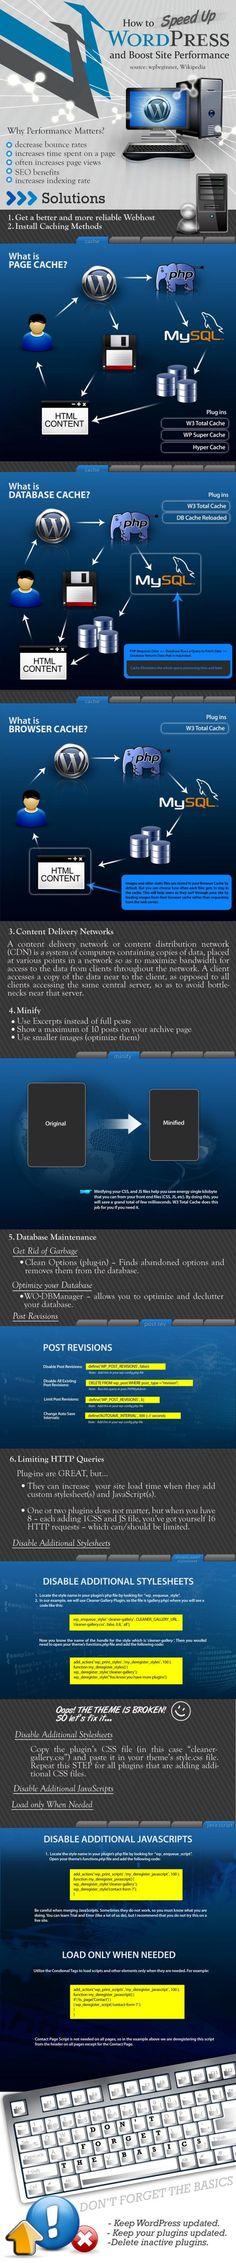 How To Speed Up WordPress And Boost Site Performance #speedoptimization #wordpress #cache